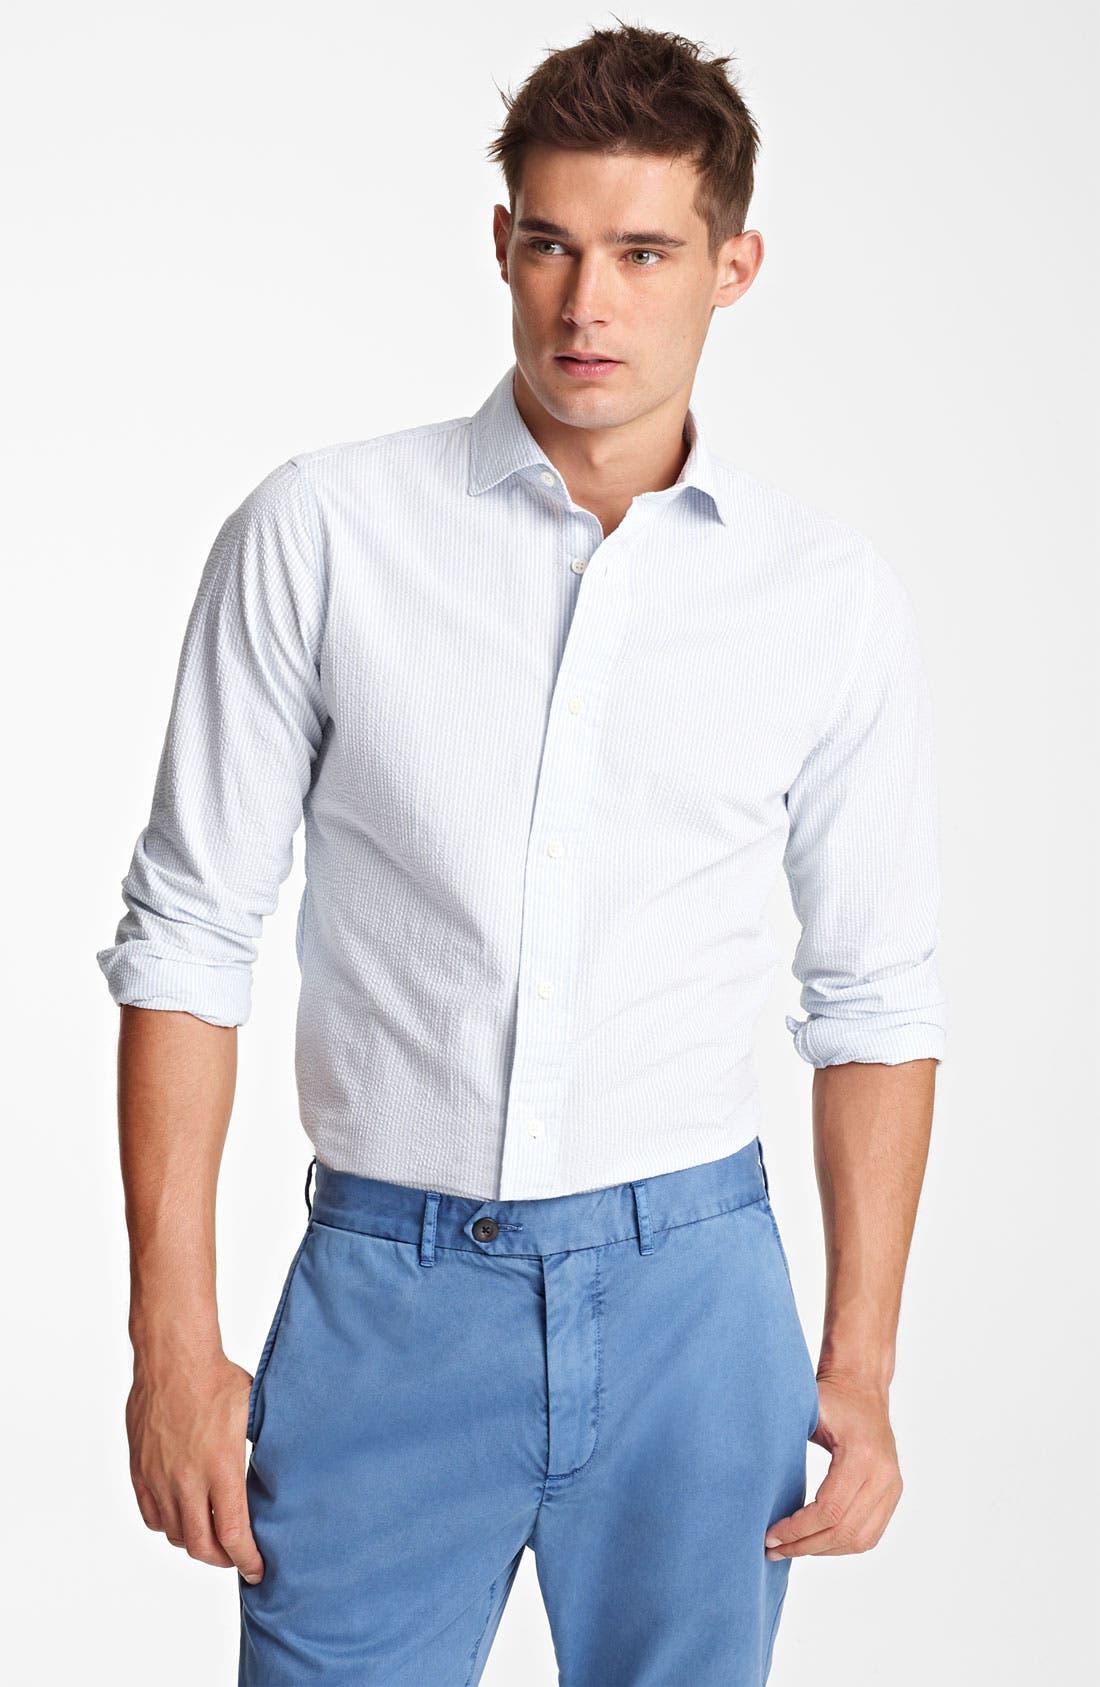 Main Image - Jack Spade 'Trombo' Seersucker Stripe Shirt